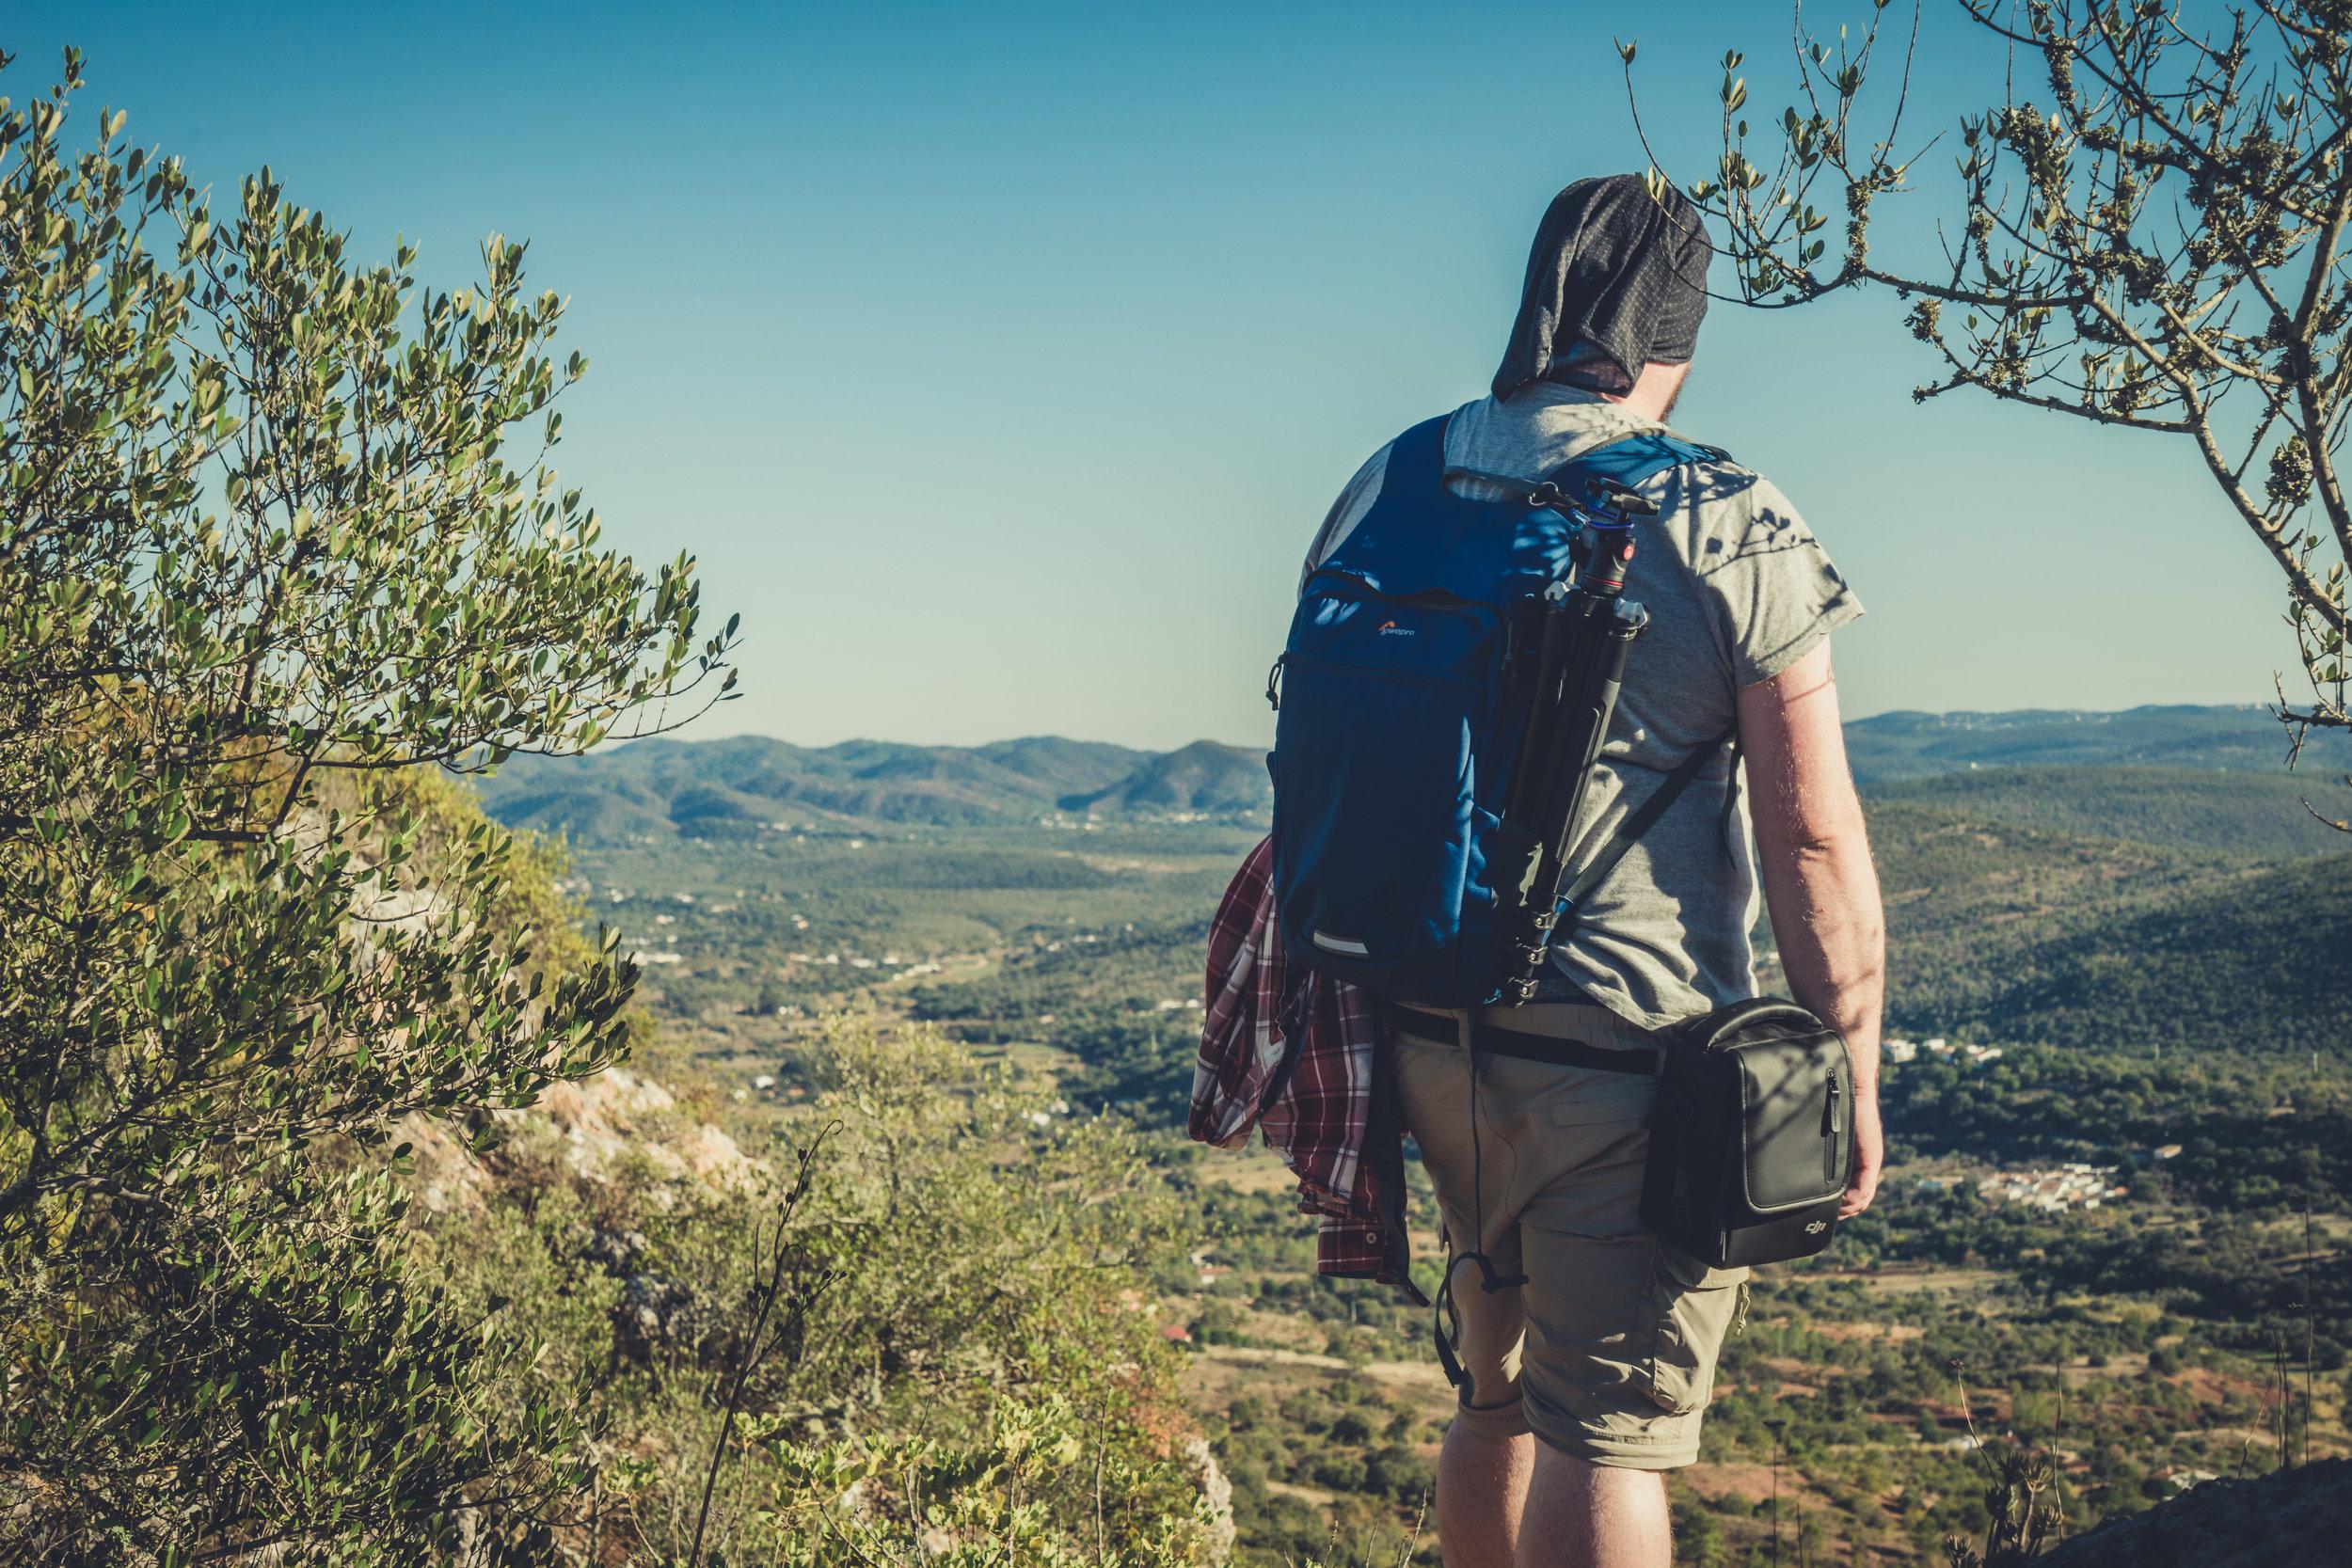 Hiking. algarve. portugal. talbe mountain. walking in the mountains. Rocha da Pena.. tree, view. green. lowepro..jpg